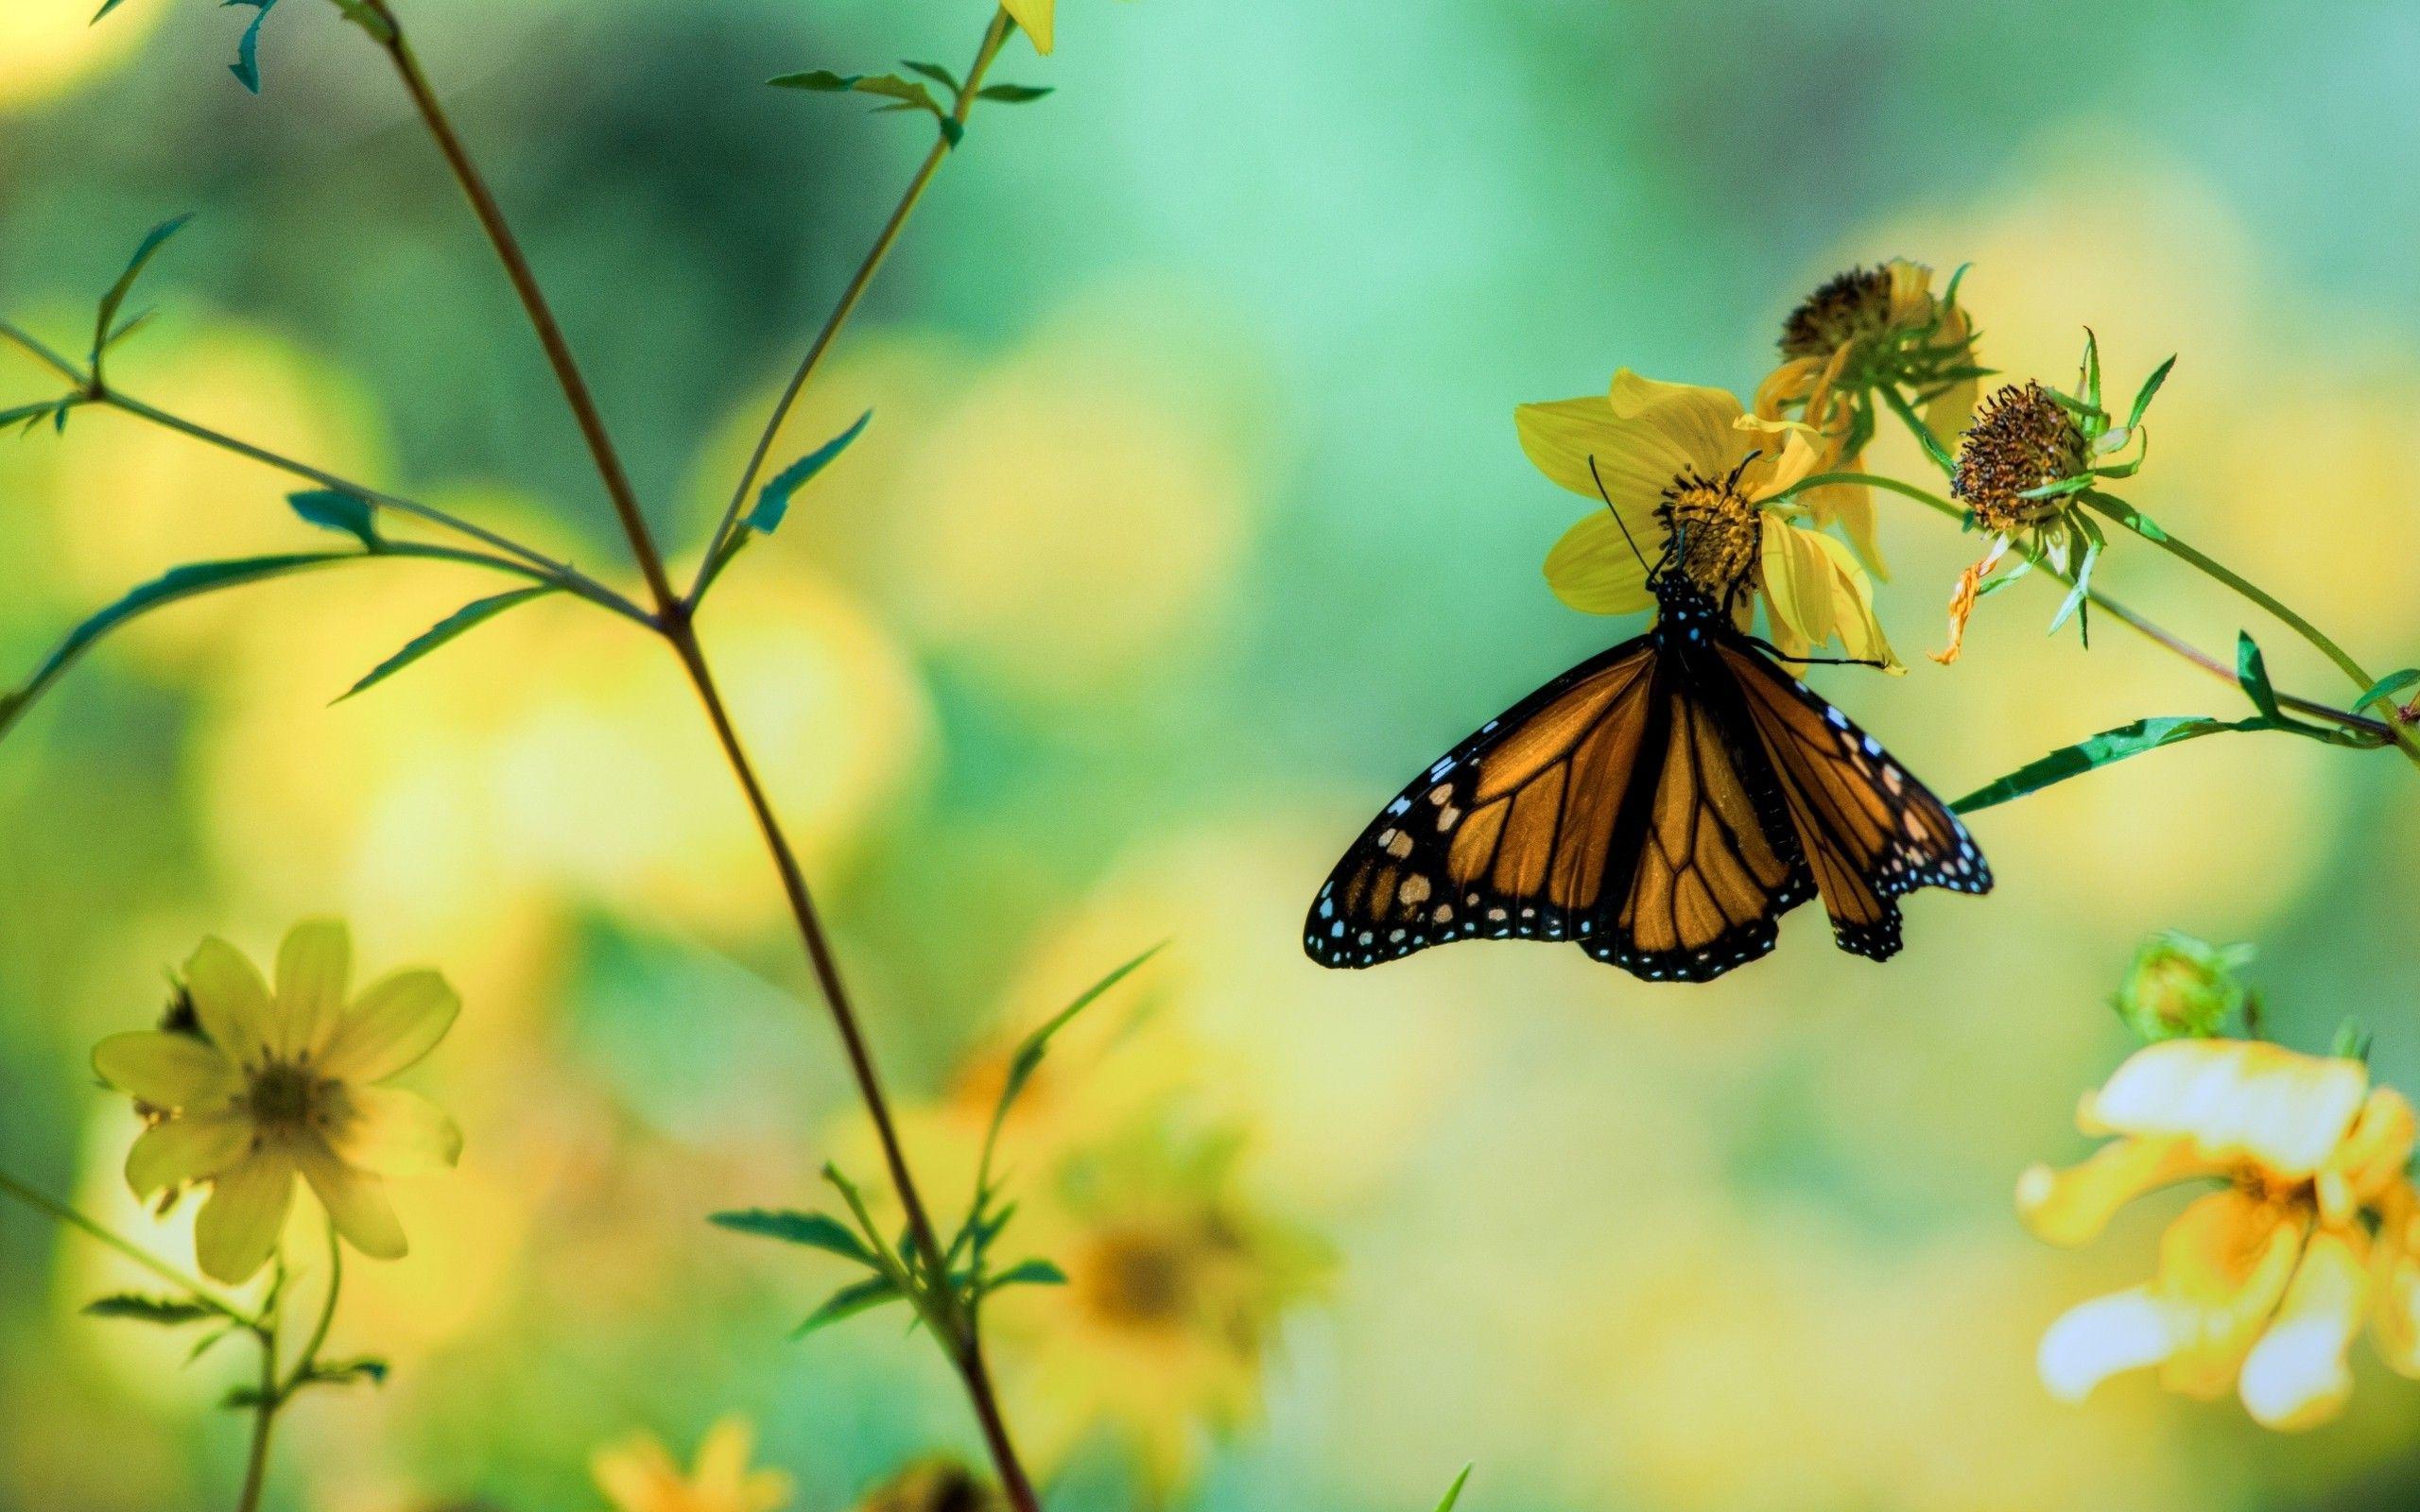 Desktop Wallpaper Full Screen Butterfly Wallpaper Beautiful Flowers Wallpapers Good Morning Images